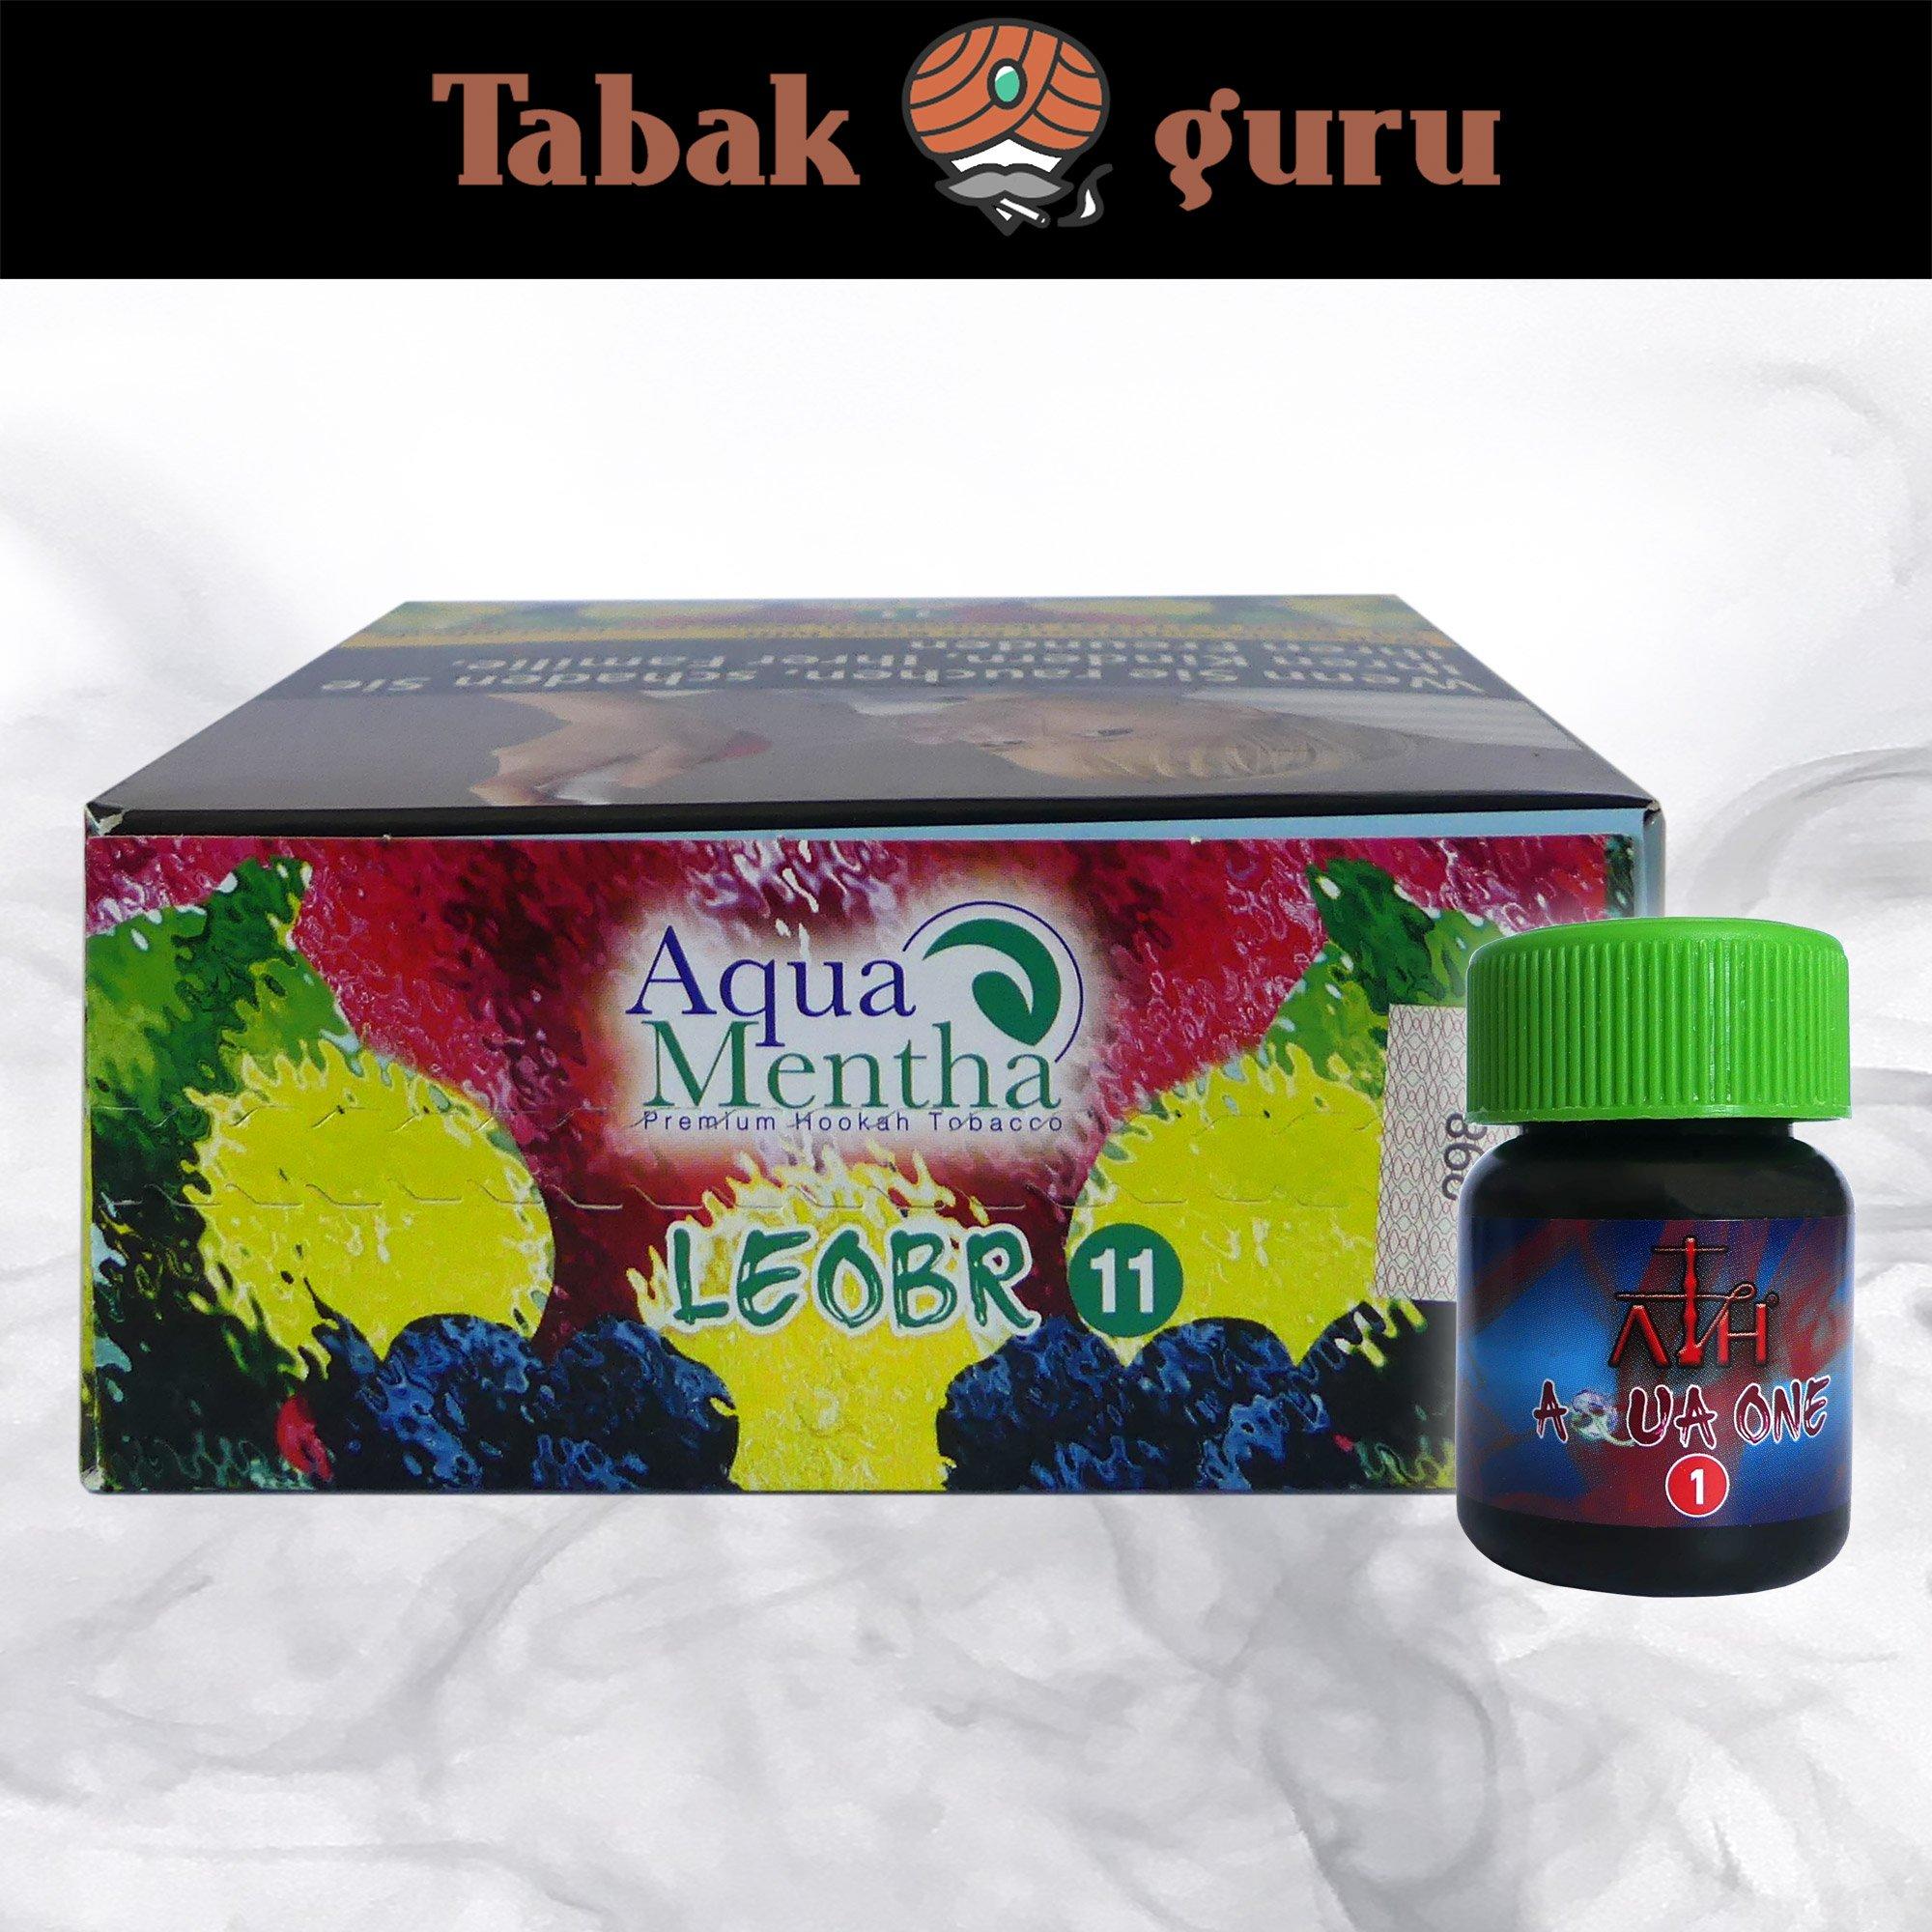 Aqua Mentha LEOBR #11 200g Shisha Tabak + ATH Aqua One Mix